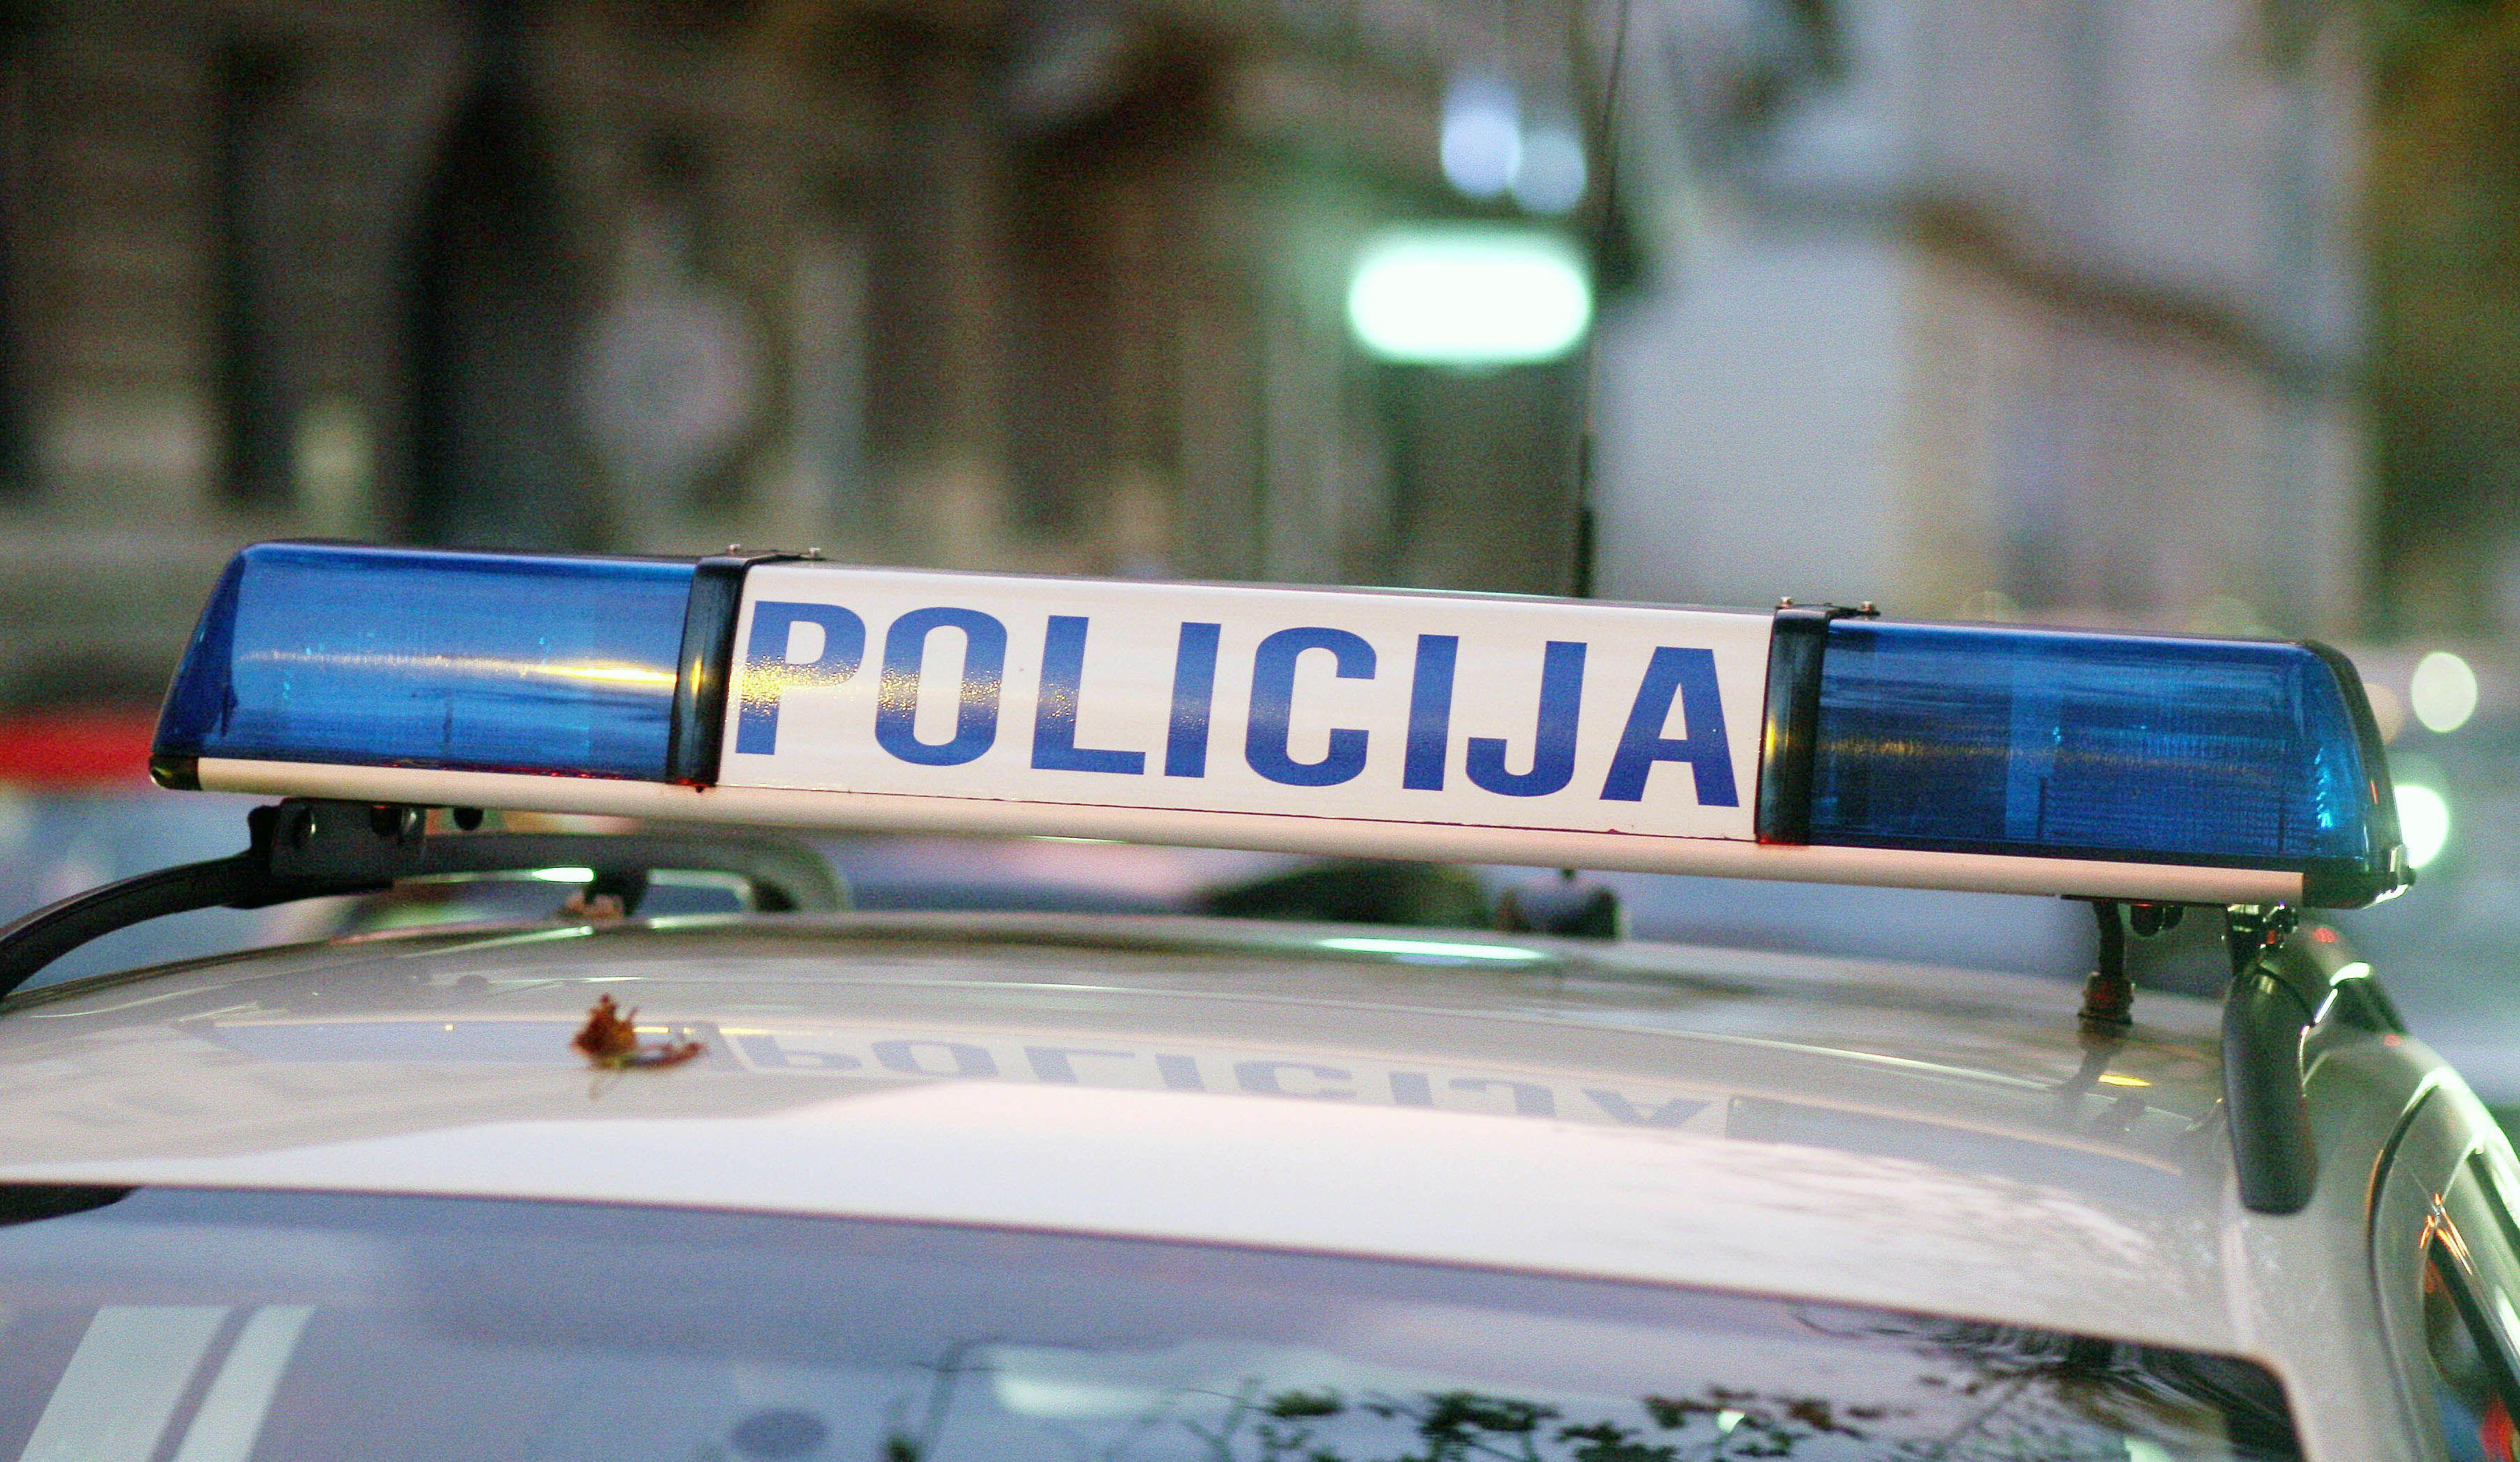 Autotransportov autobus zapalio se kod Drniša, nema ozlijeđenih